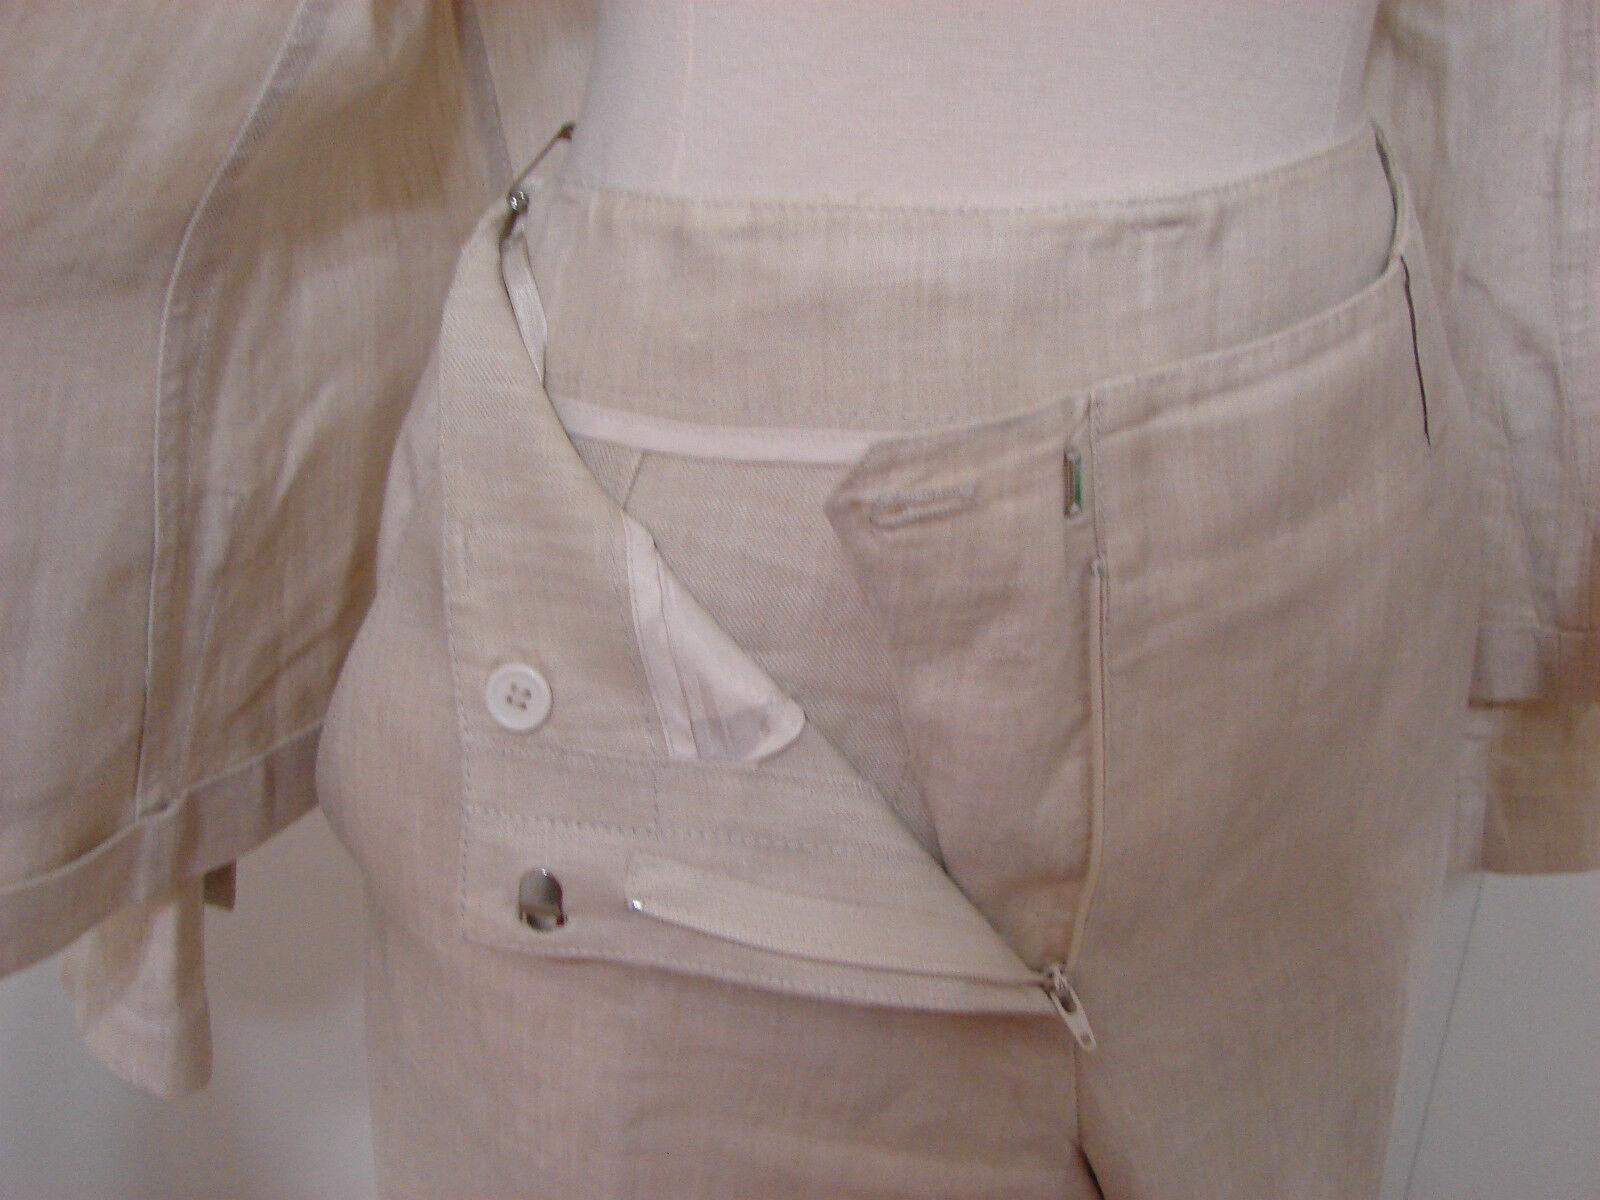 Donna Karan DKNY Pant Suit & Jacket Cream 100% Li… - image 3